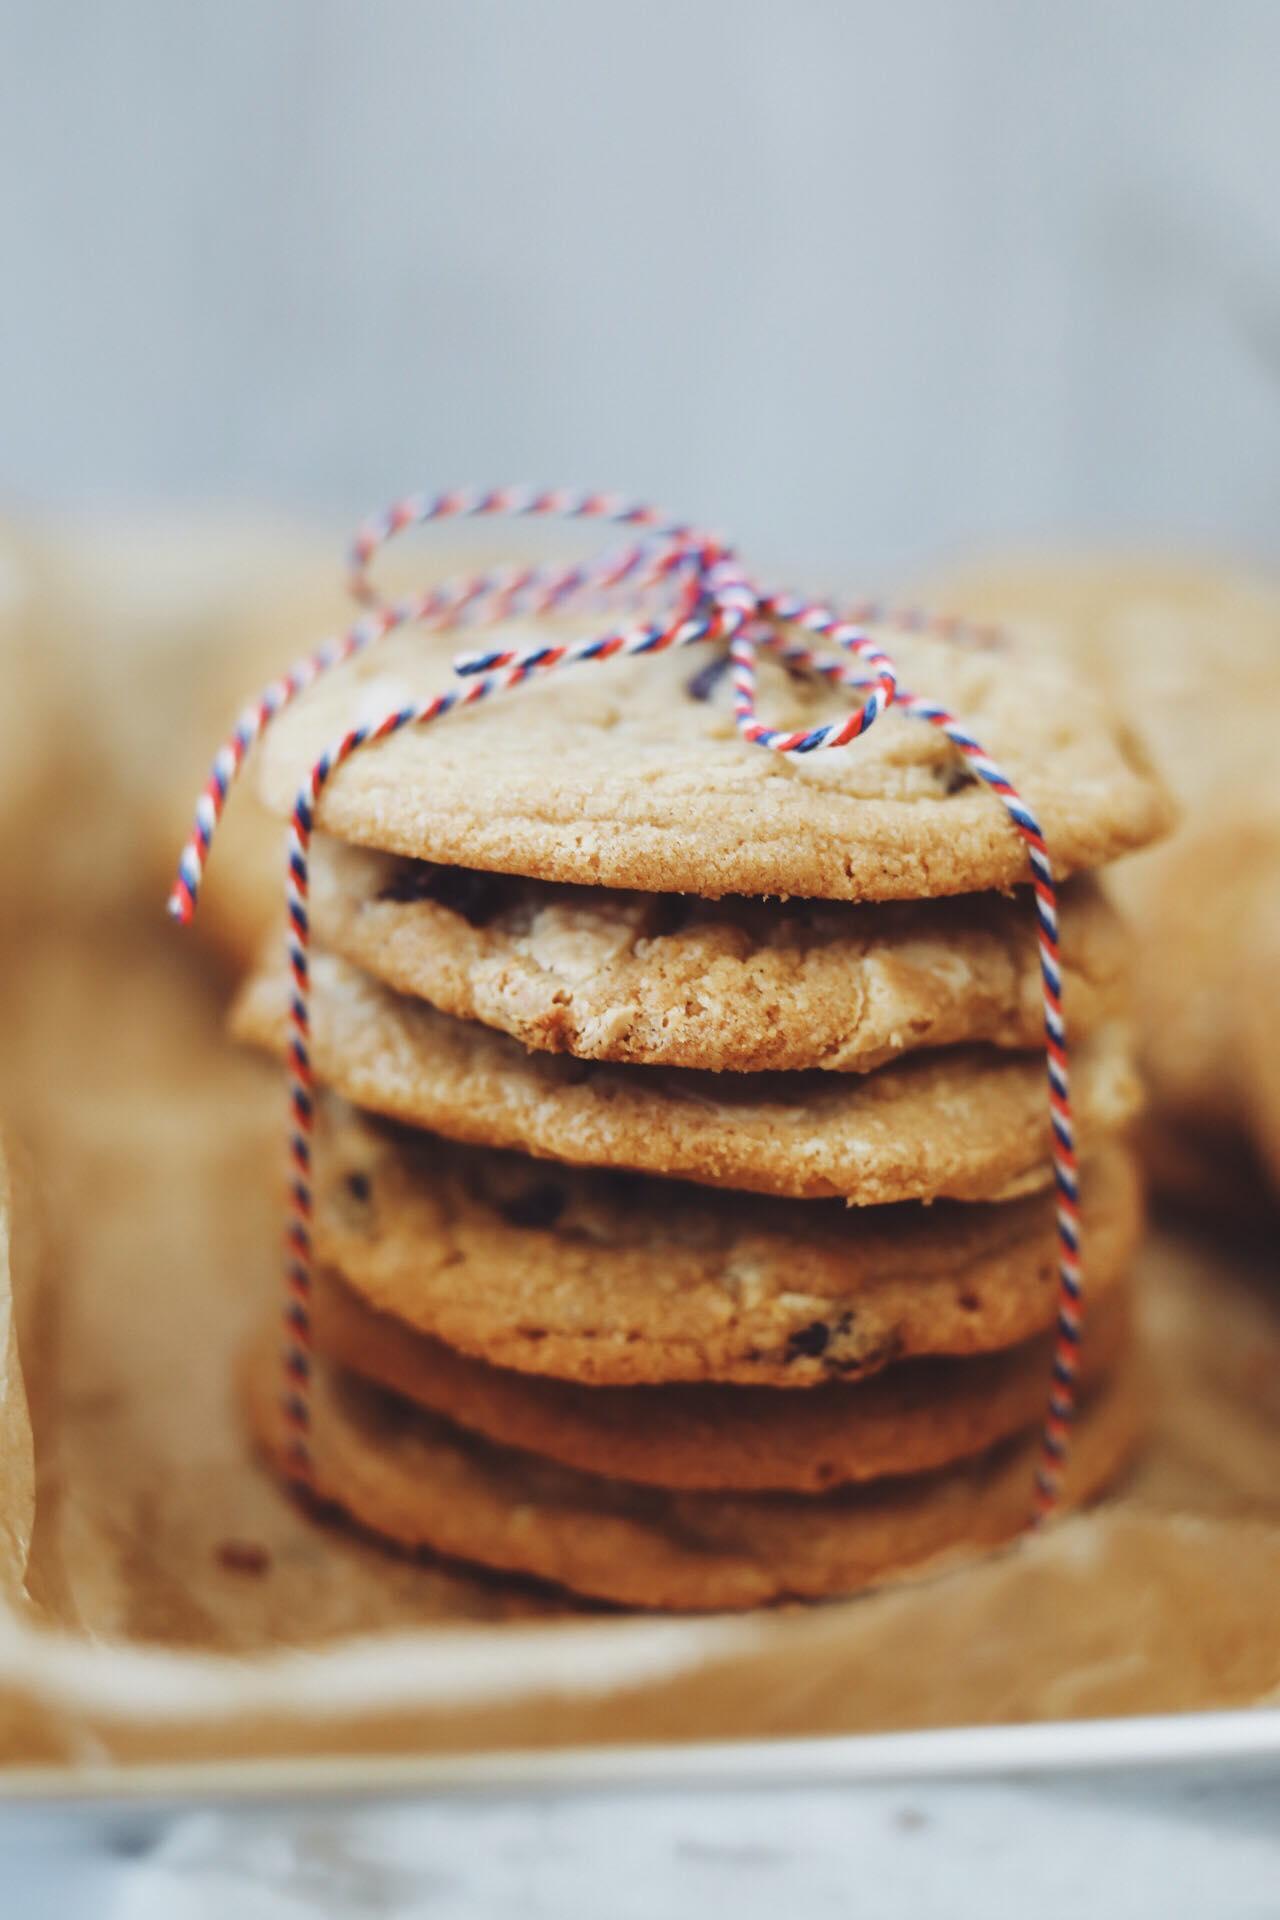 FreJulecookies med hvid chokolade og tranebær